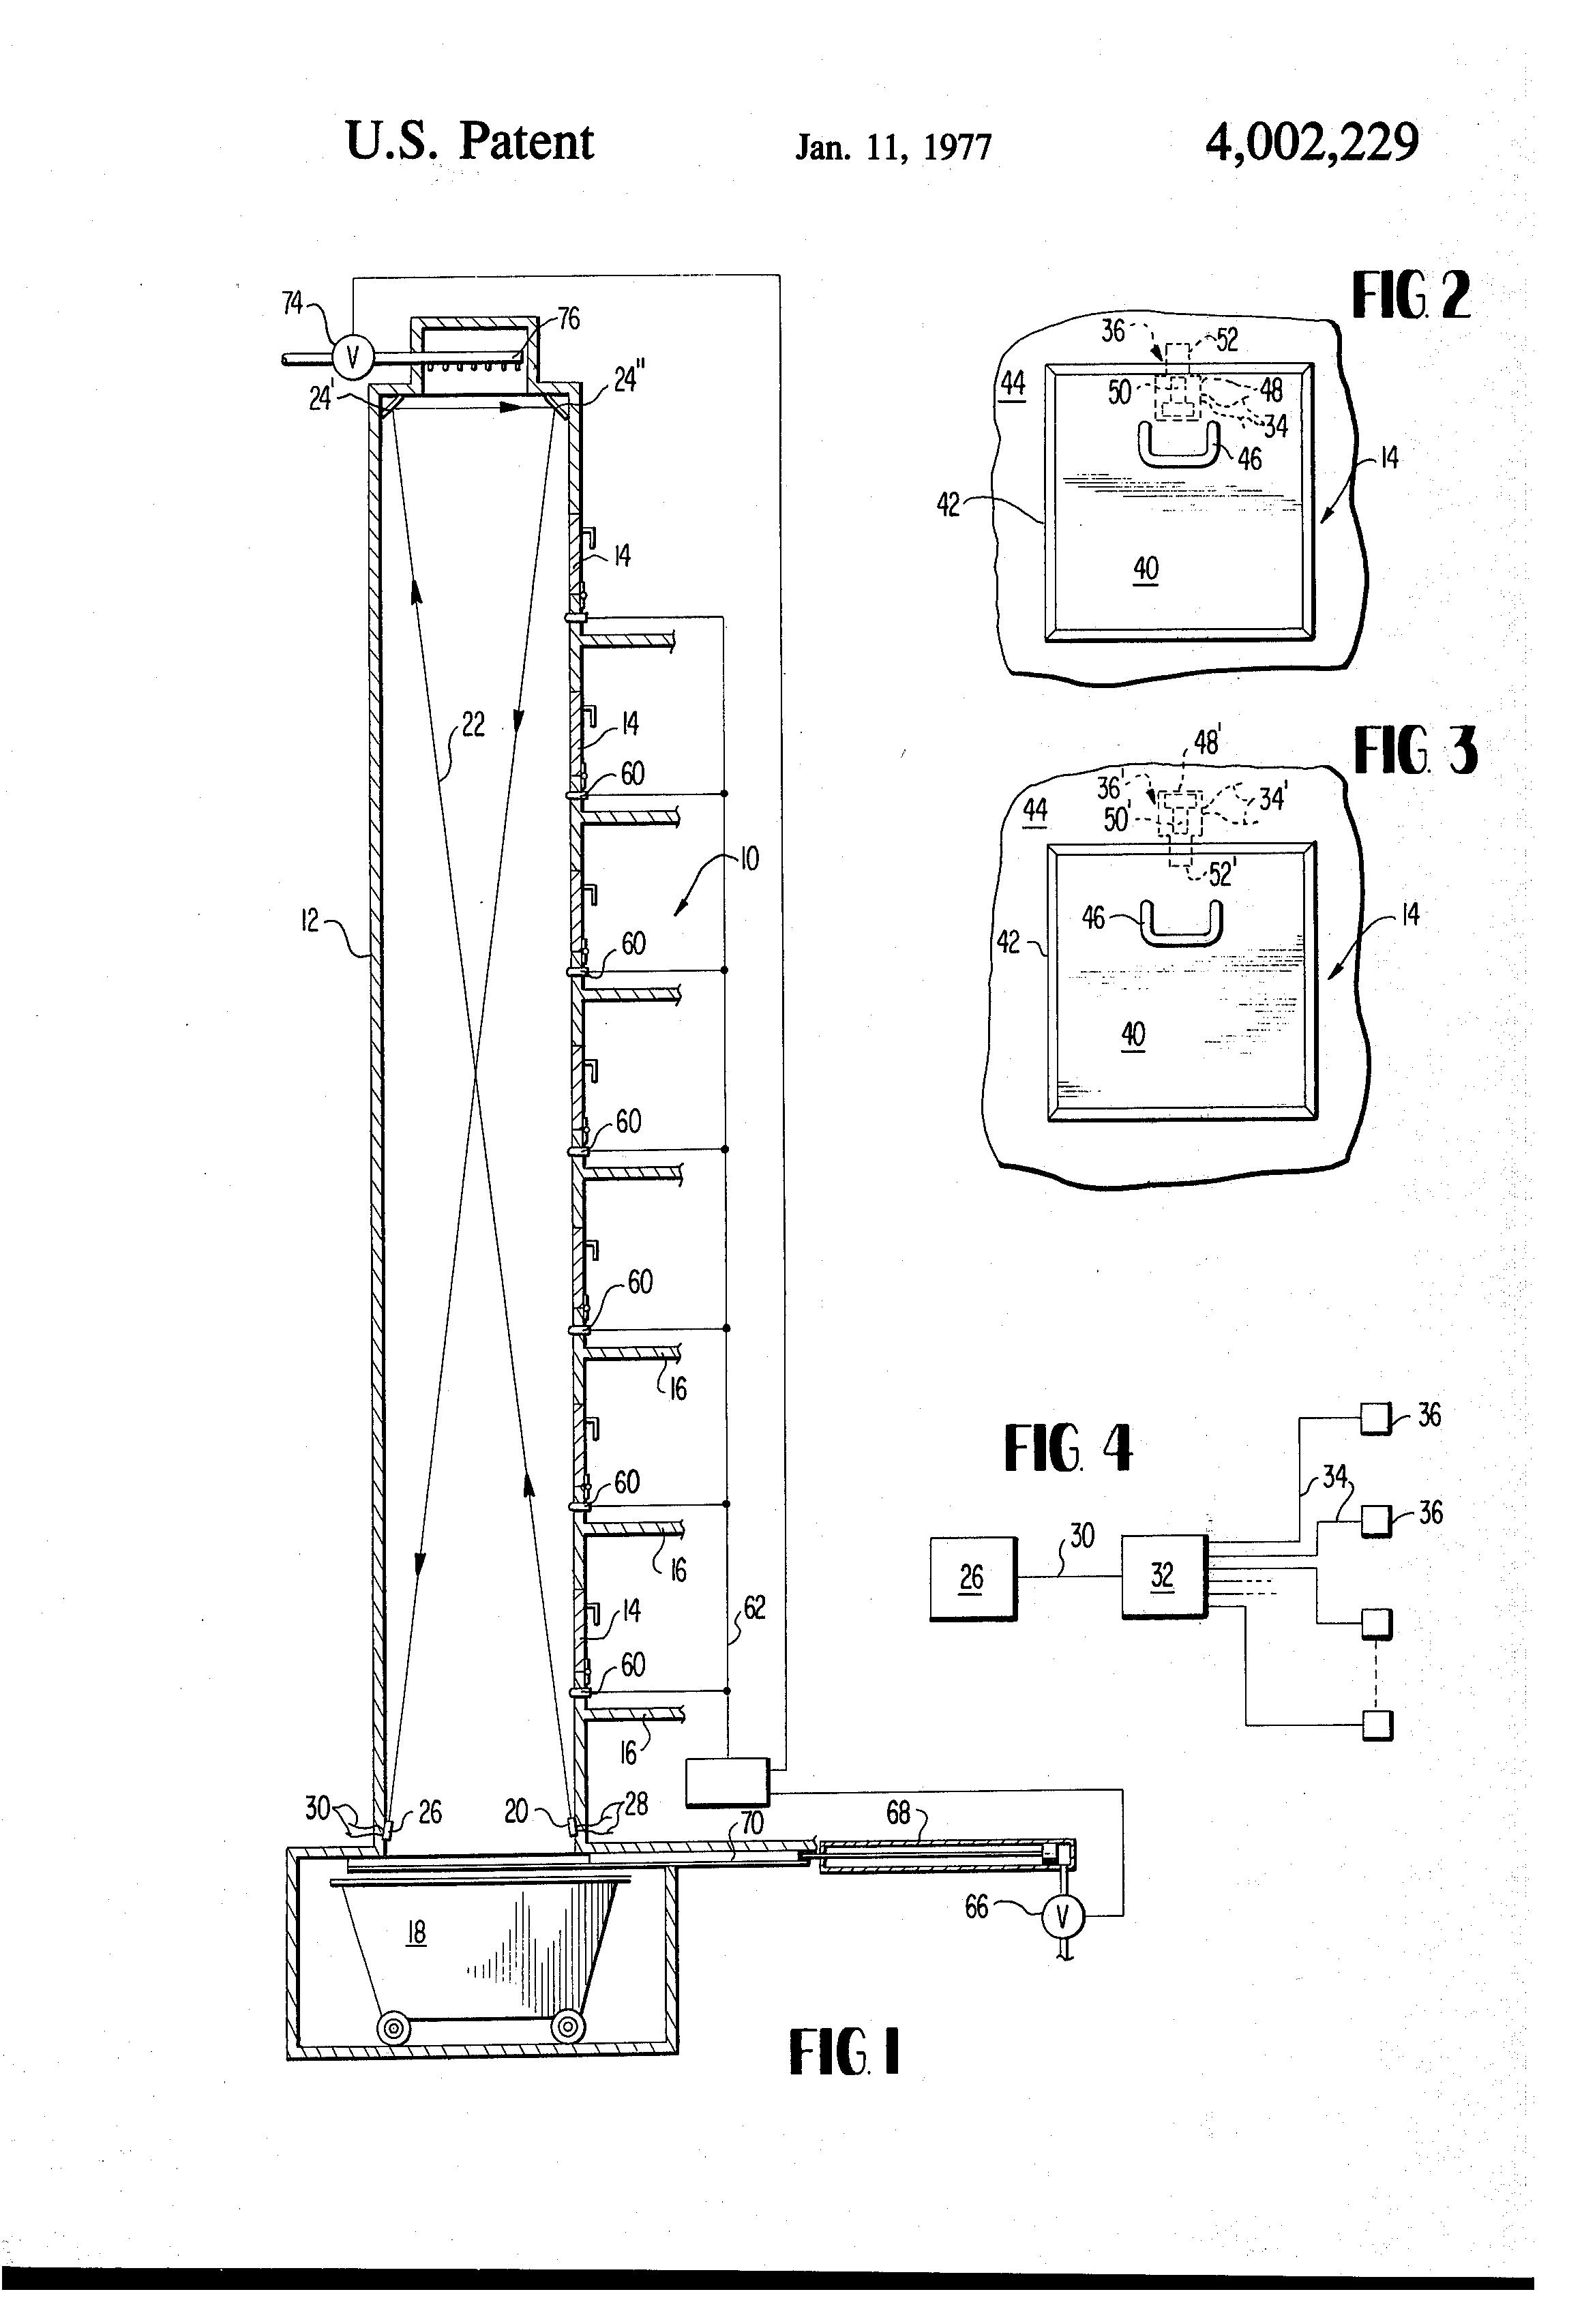 Trash Chute Details : Patent us trash chute locking system google patents